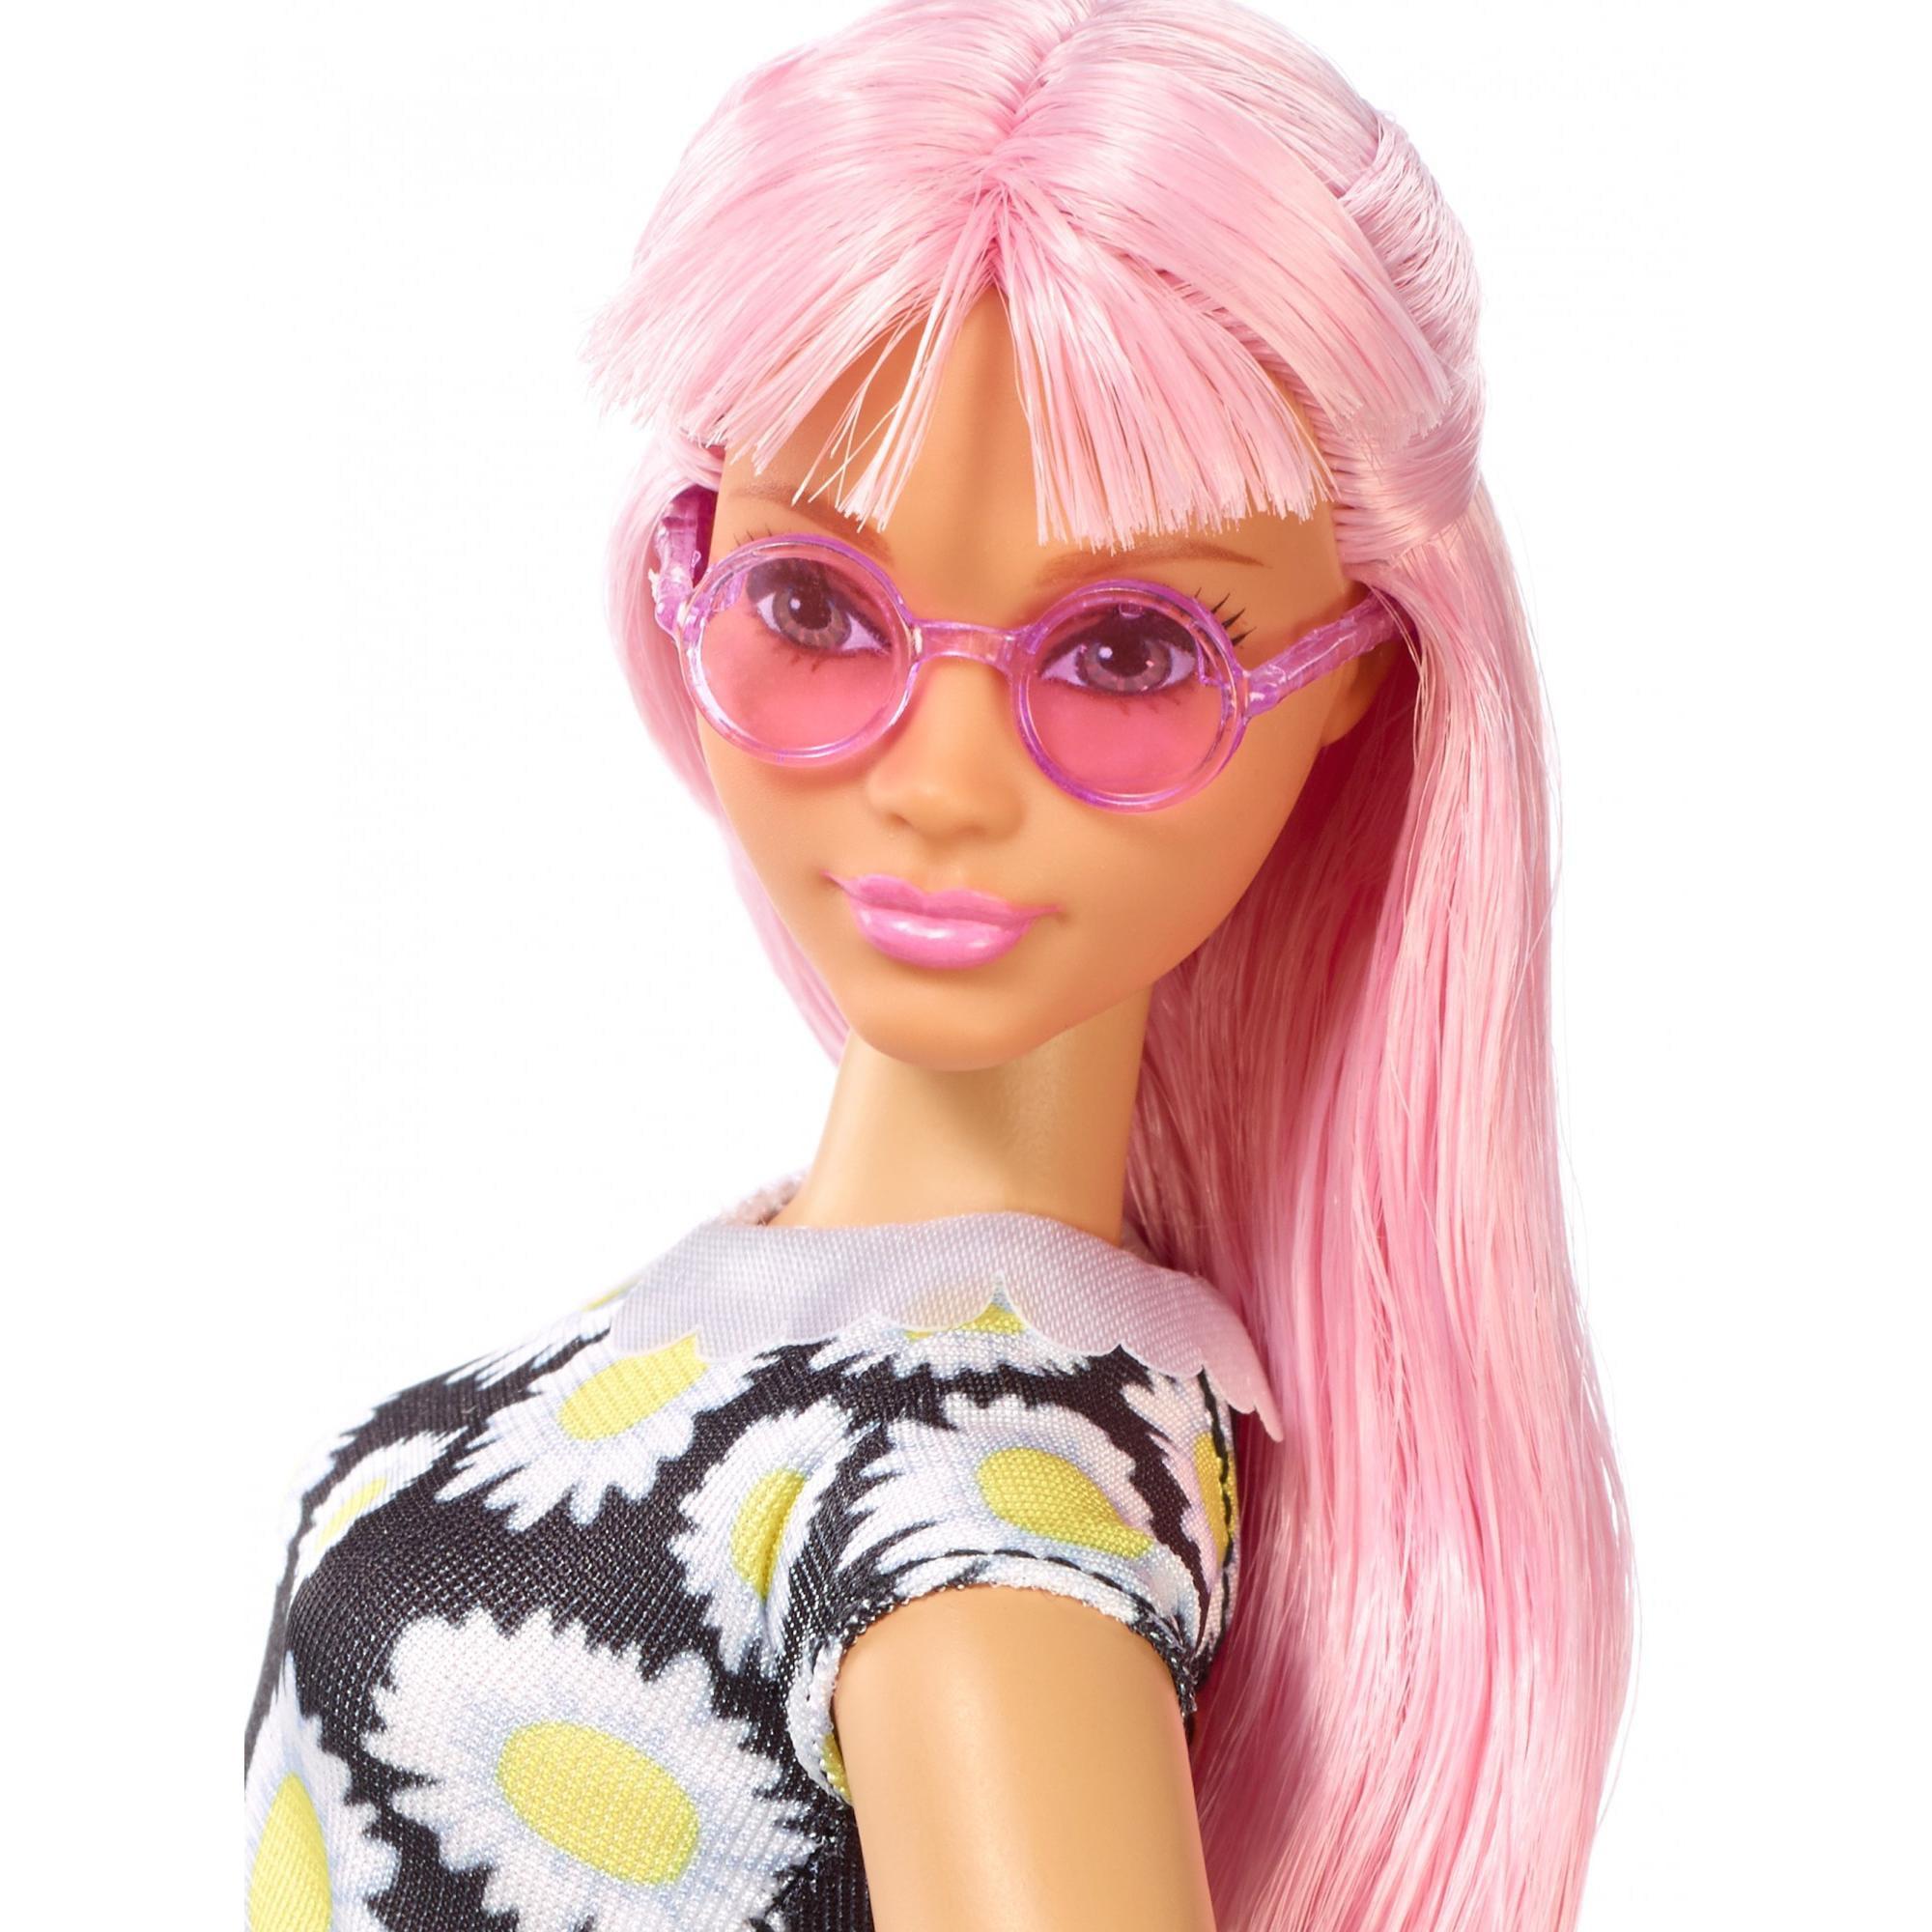 Barbie Pink Nude Photos 5